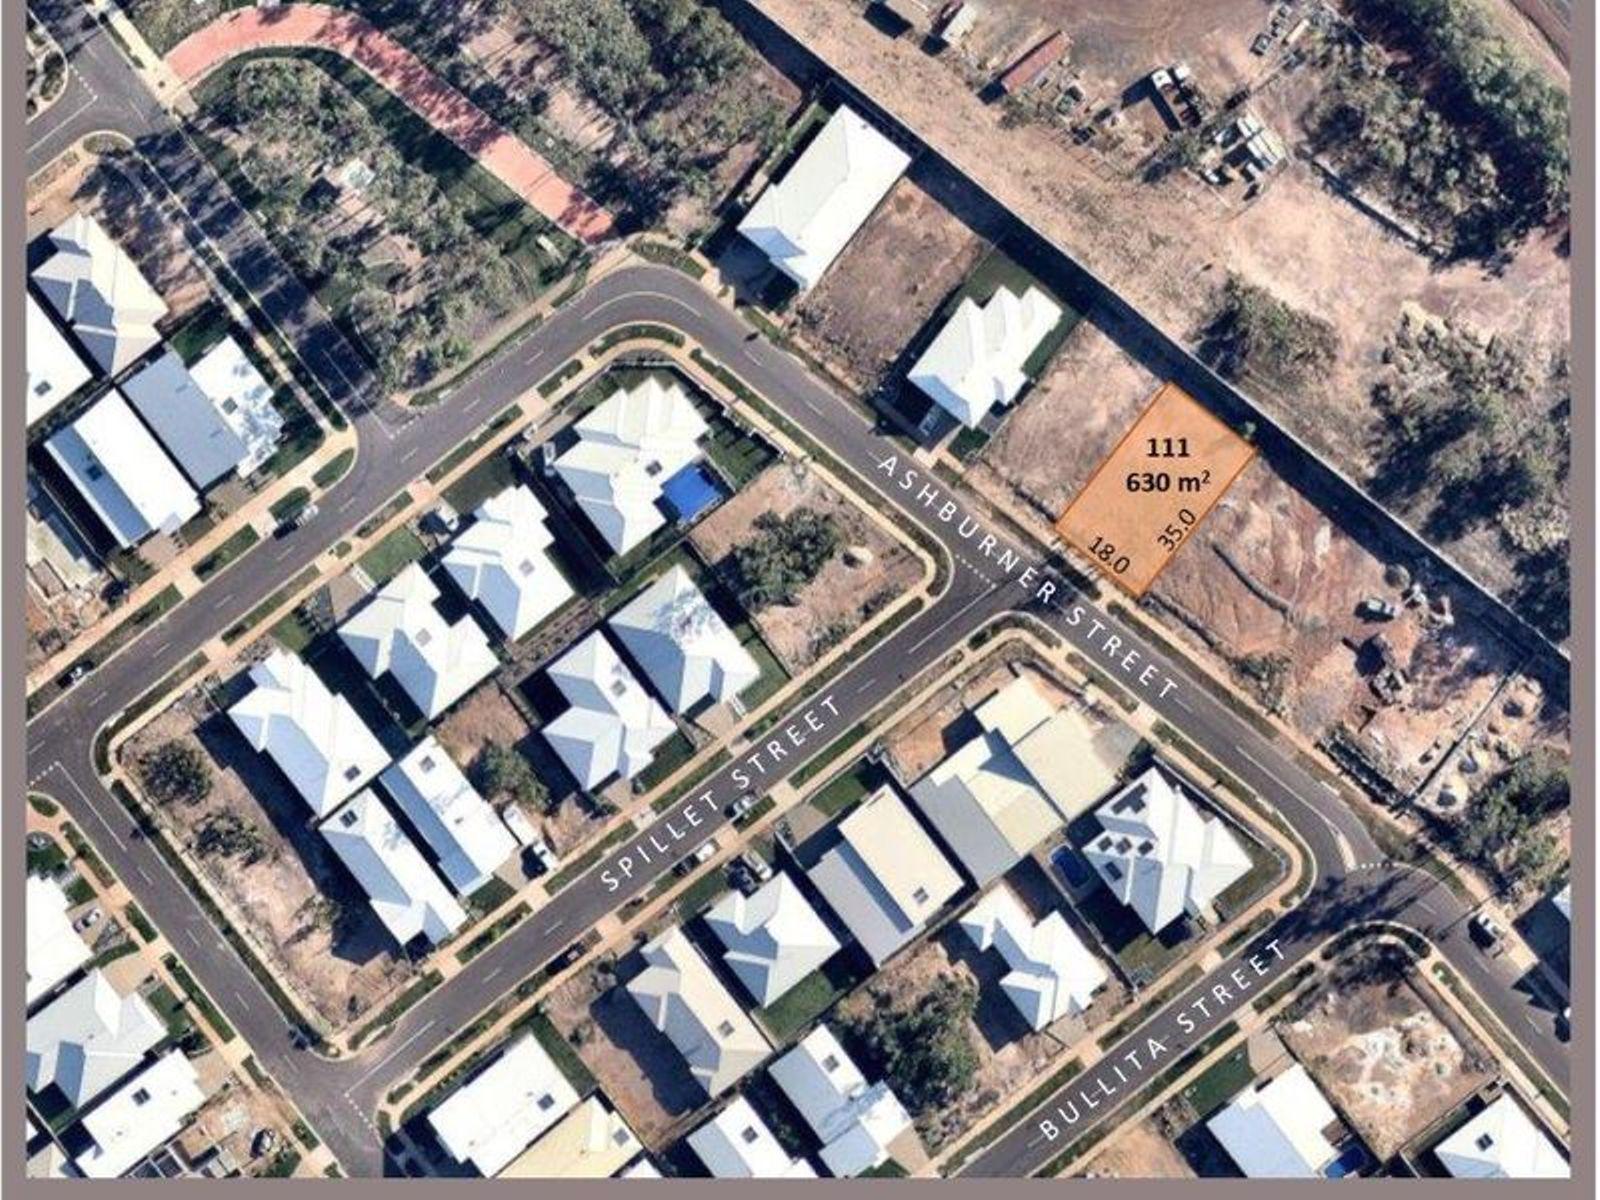 Lot 6 Ashburner Street, Durack, NT 0830